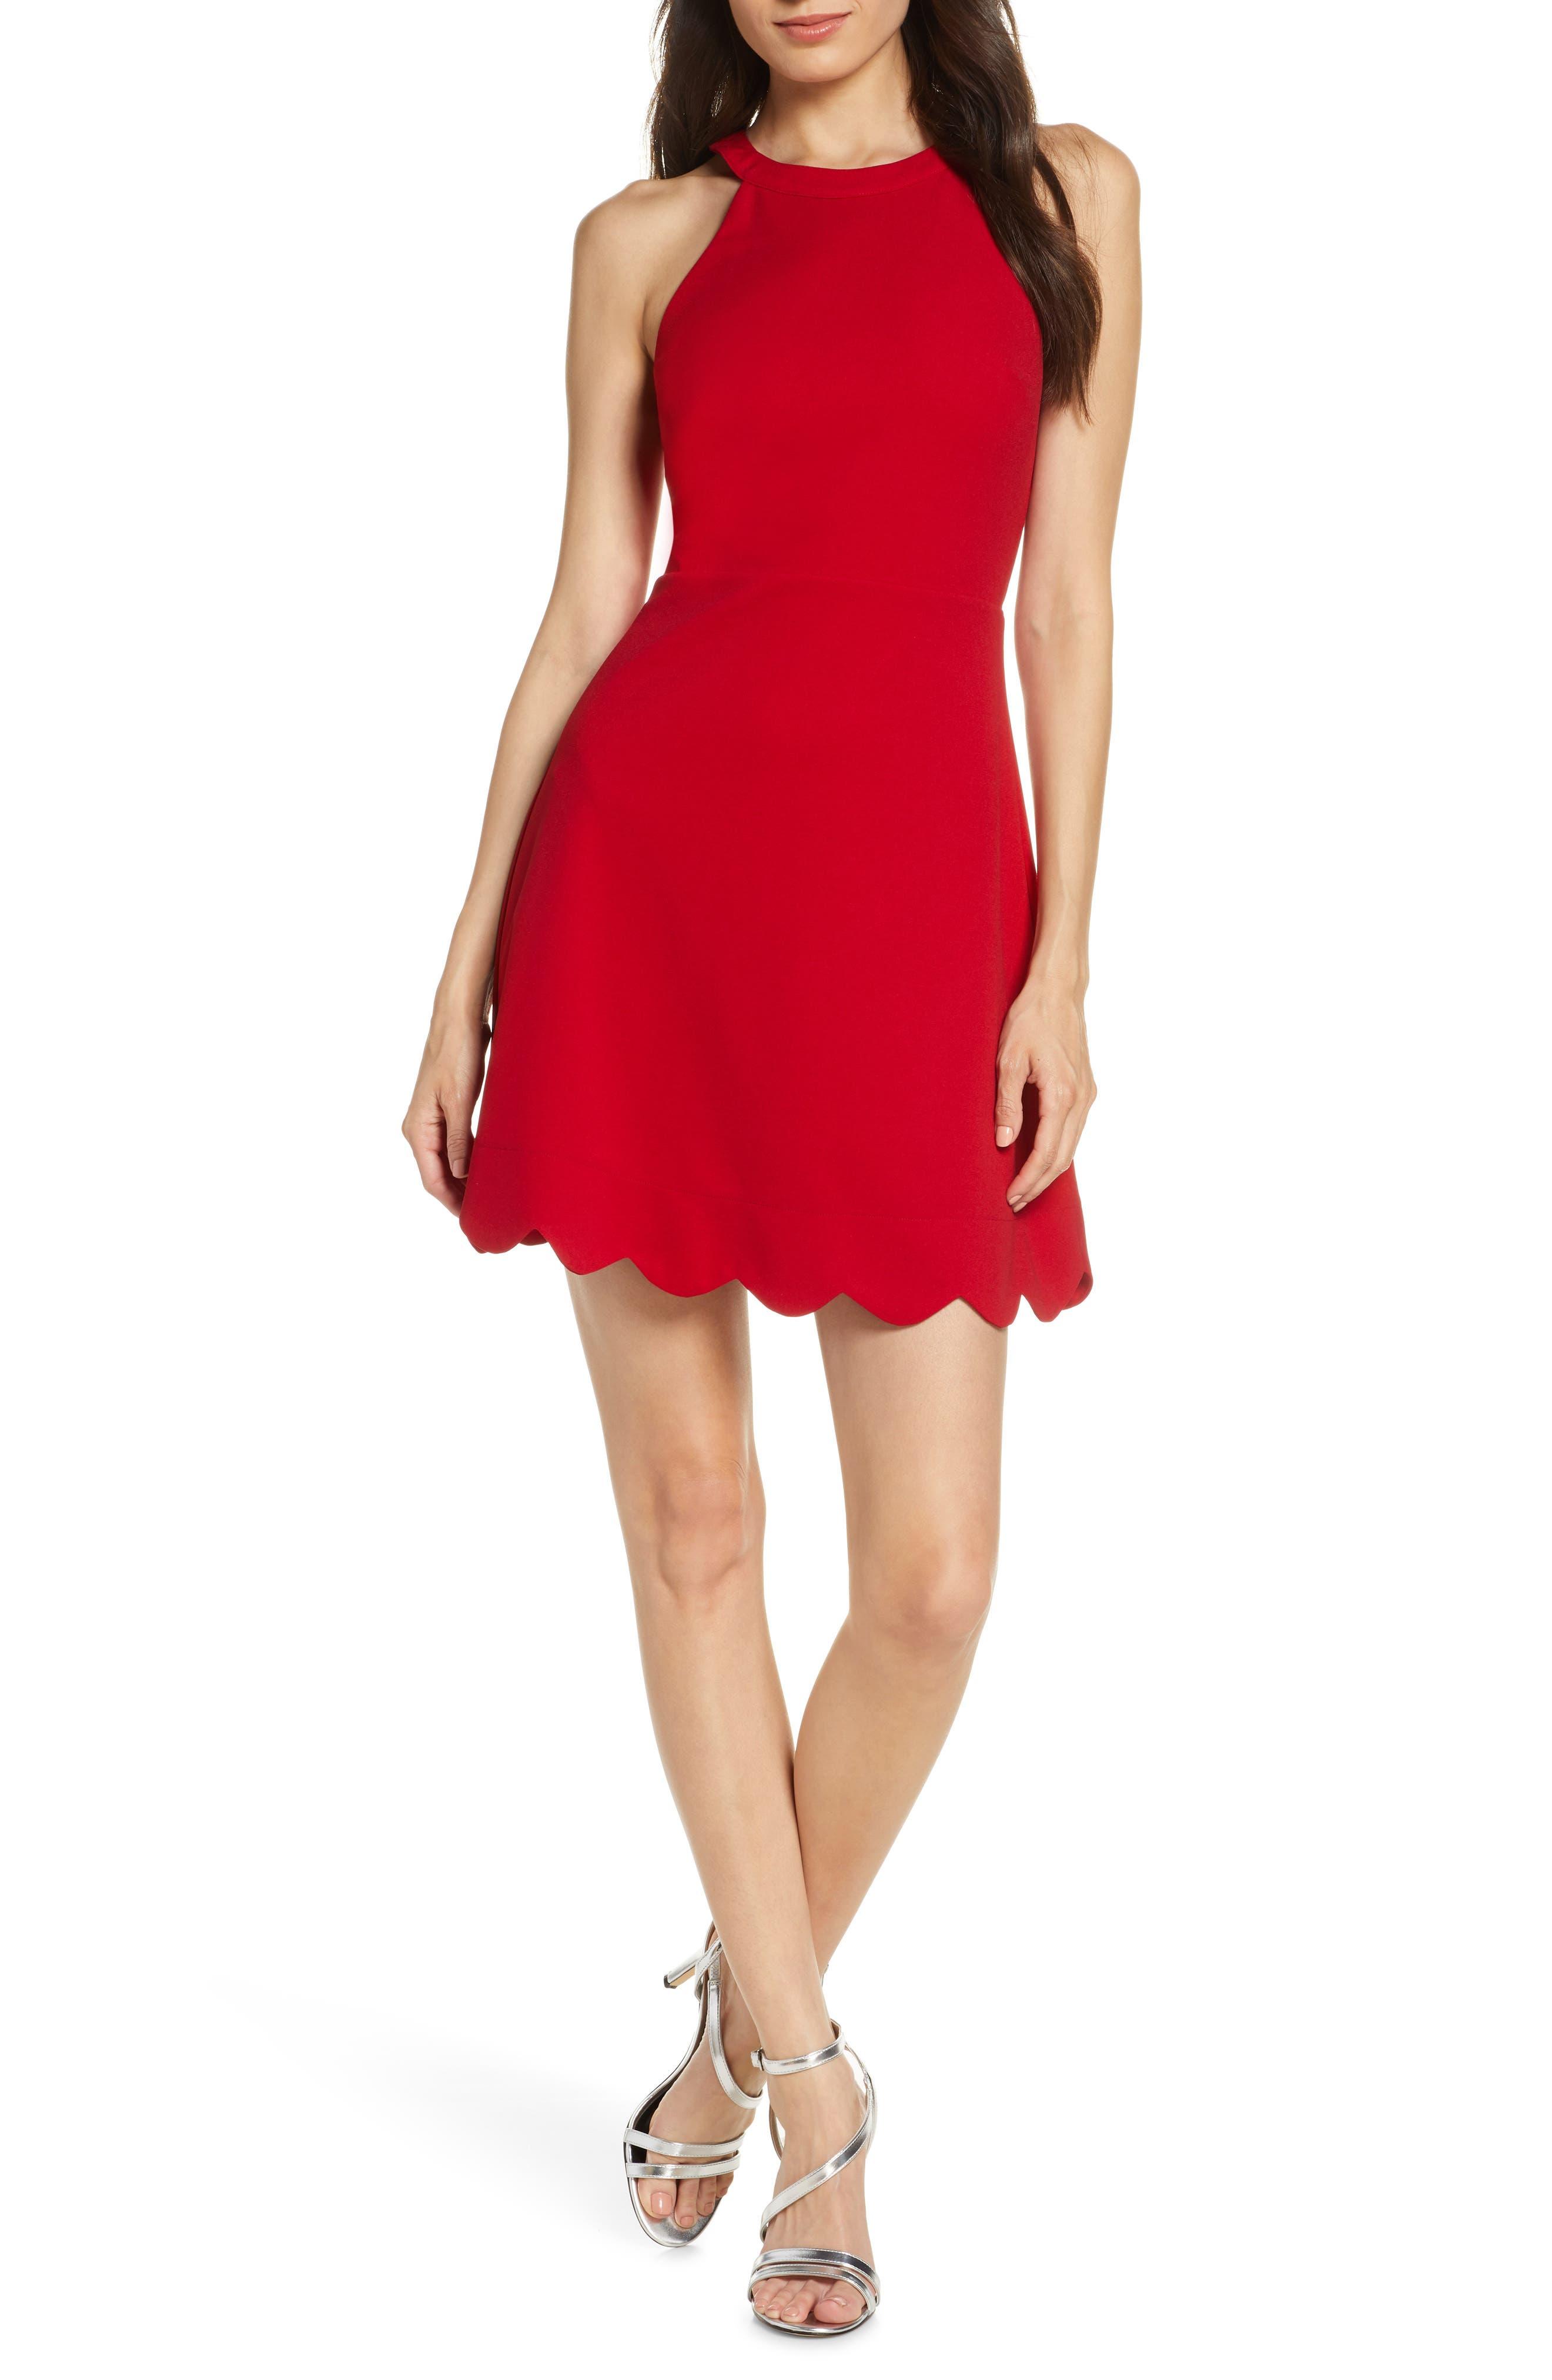 Lulus Mamacita Halter Minidress, Red